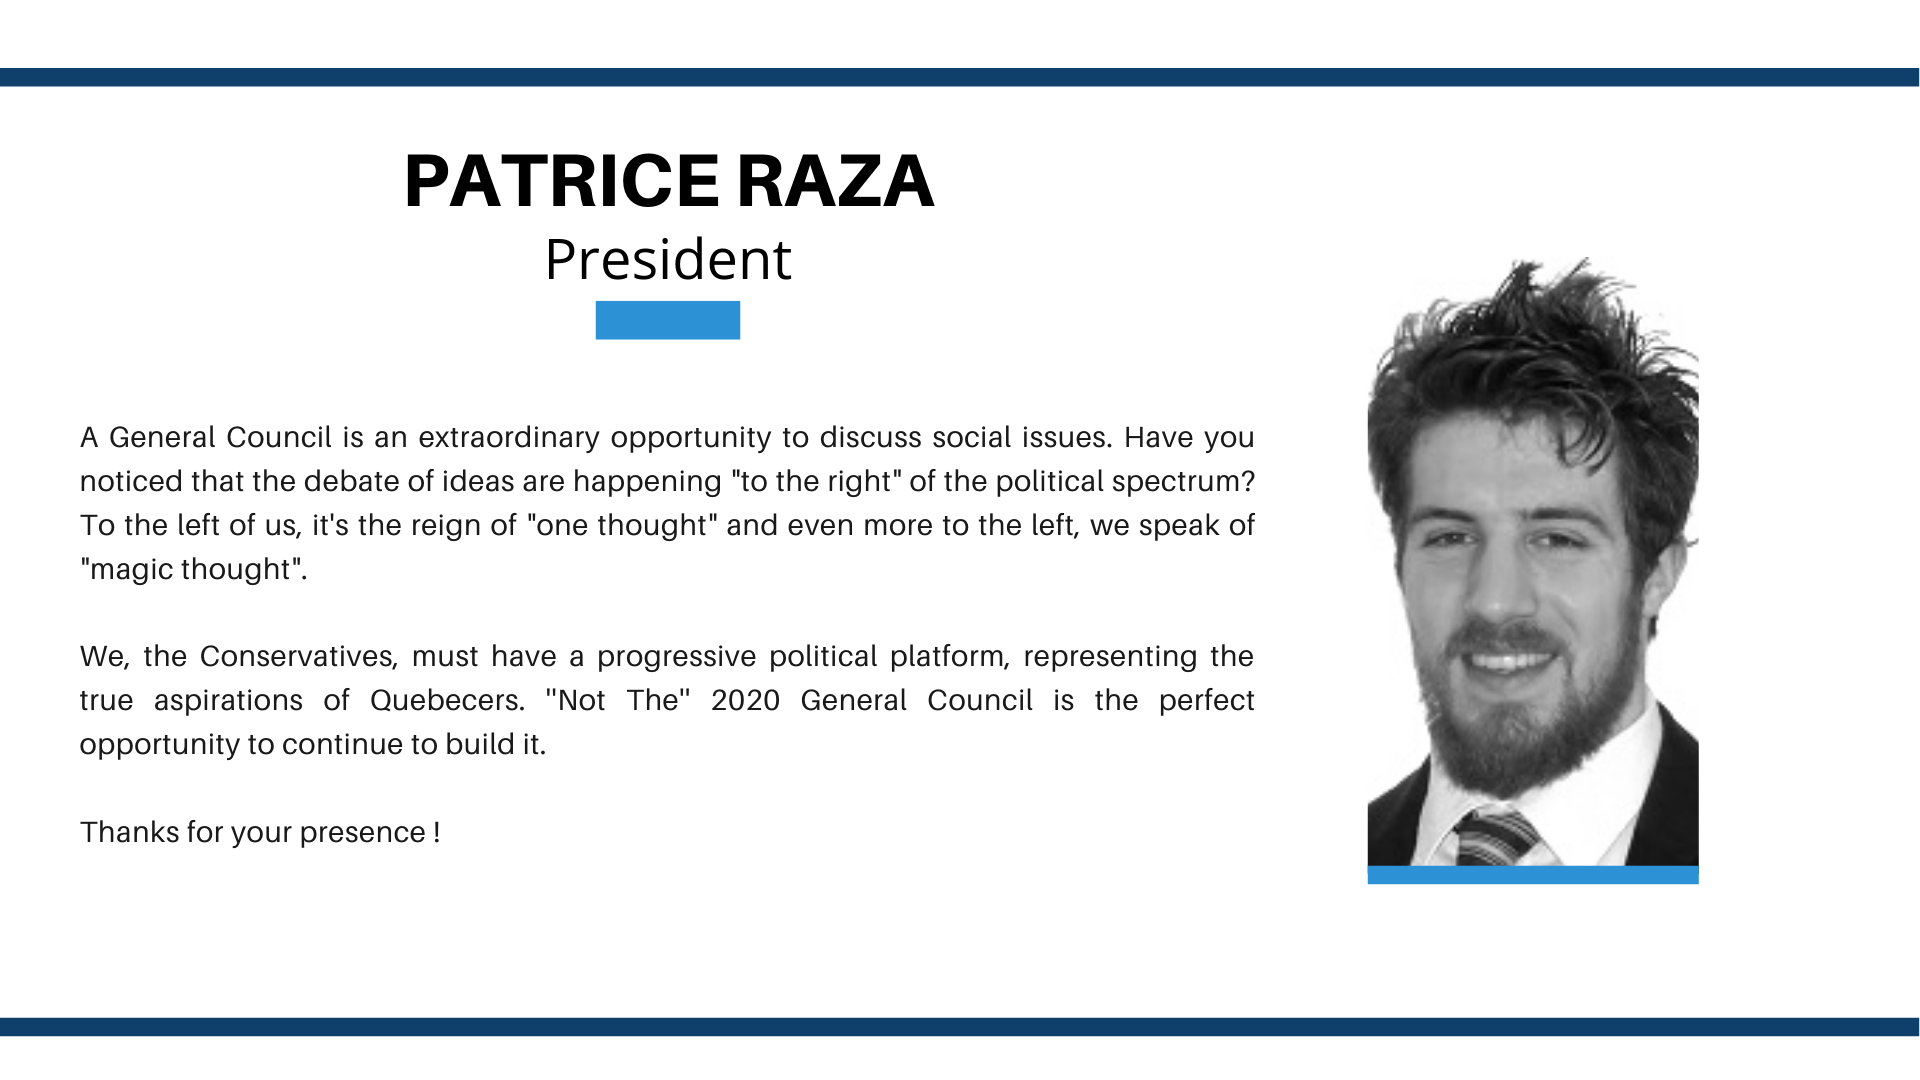 CG2020 Welcome Patrice Raza